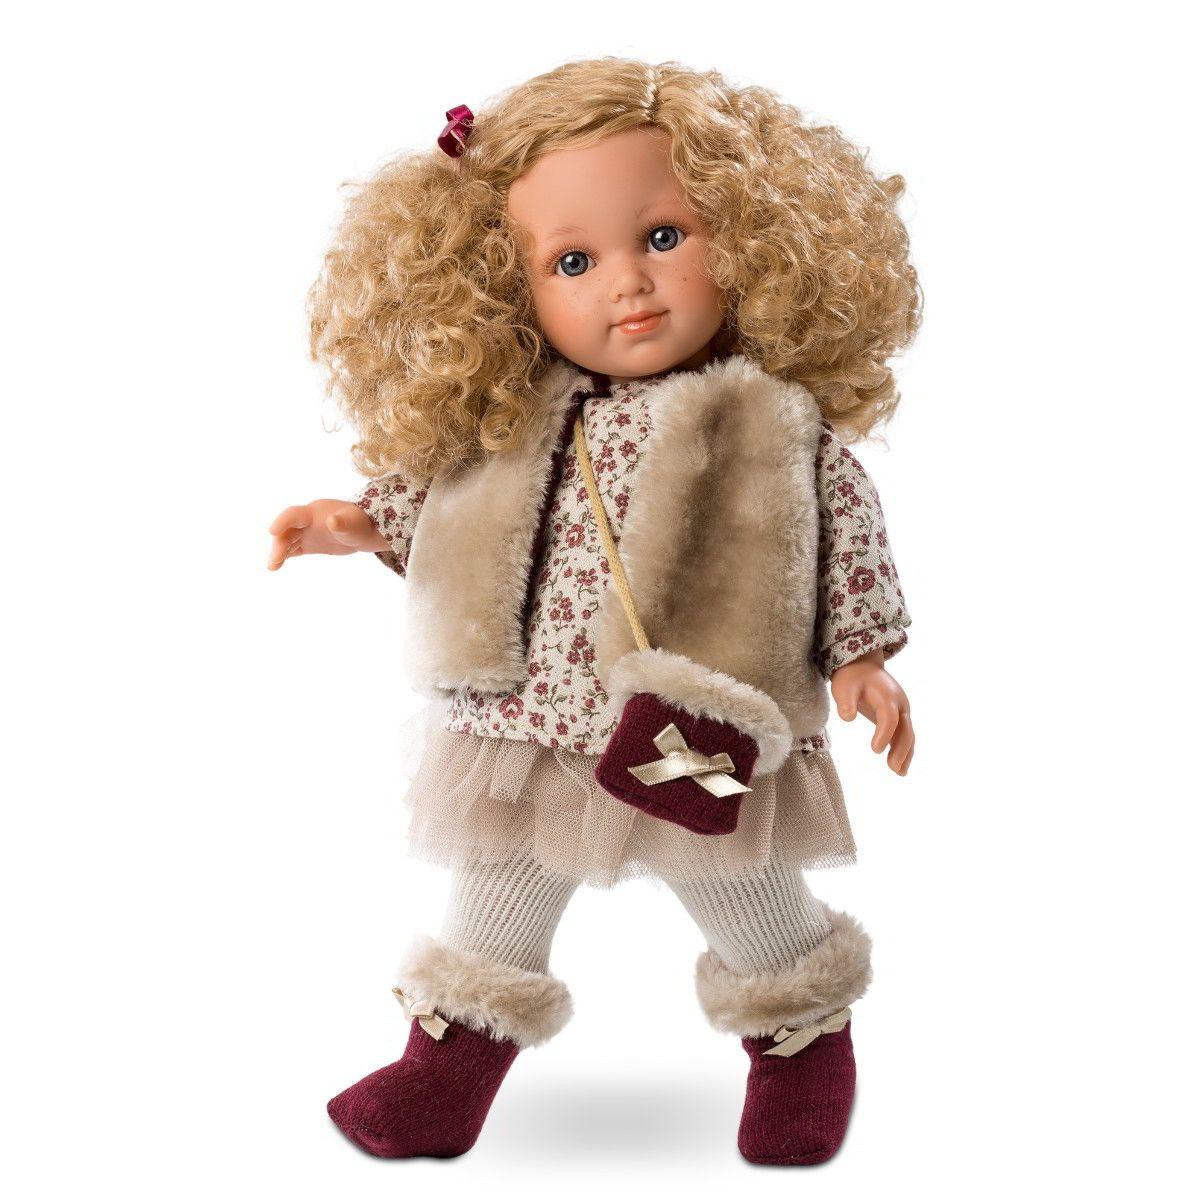 Кукла Елена, 35 смИспанские куклы Llorens Juan, S.L.<br>Кукла Елена, 35 см<br>